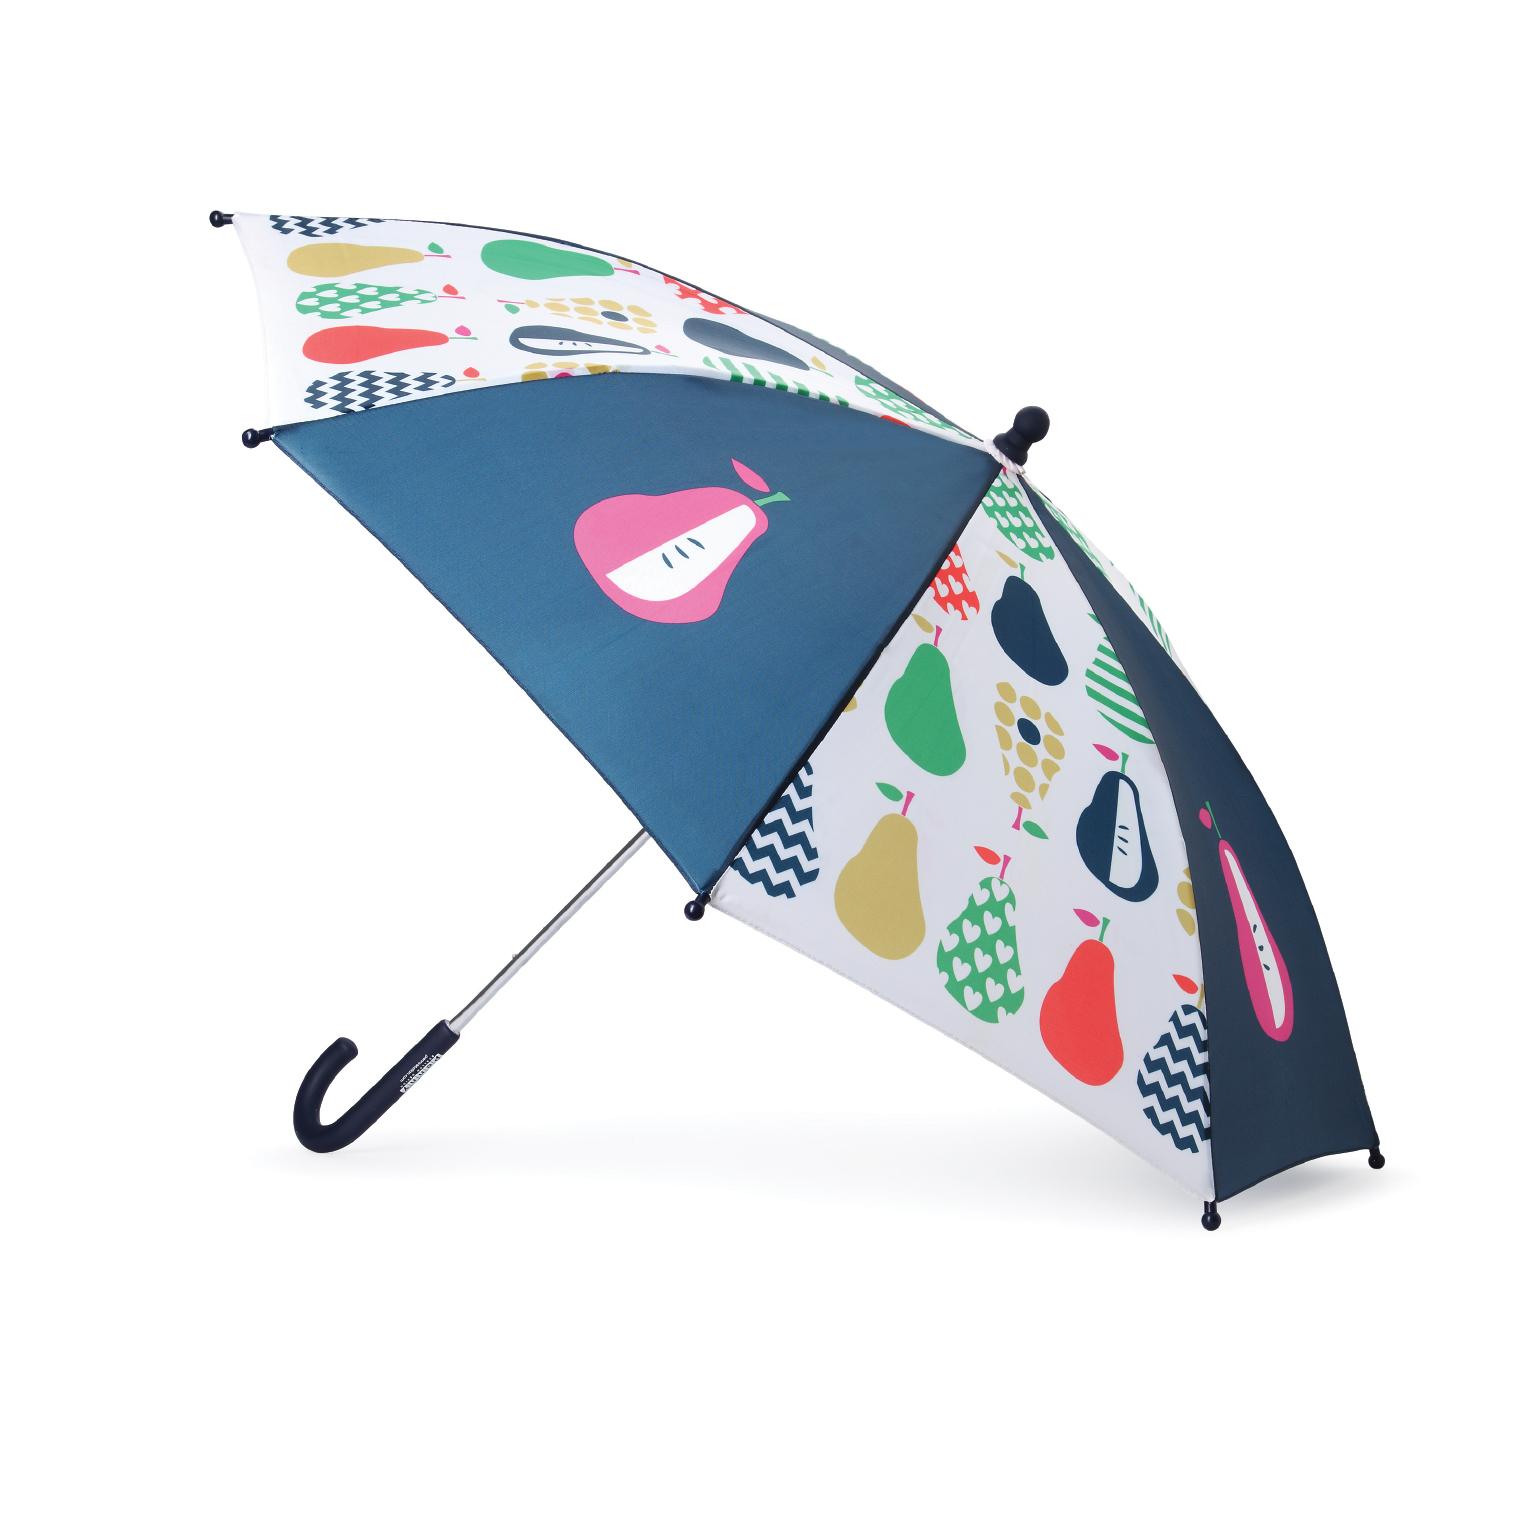 Pear Salad Umbrella image